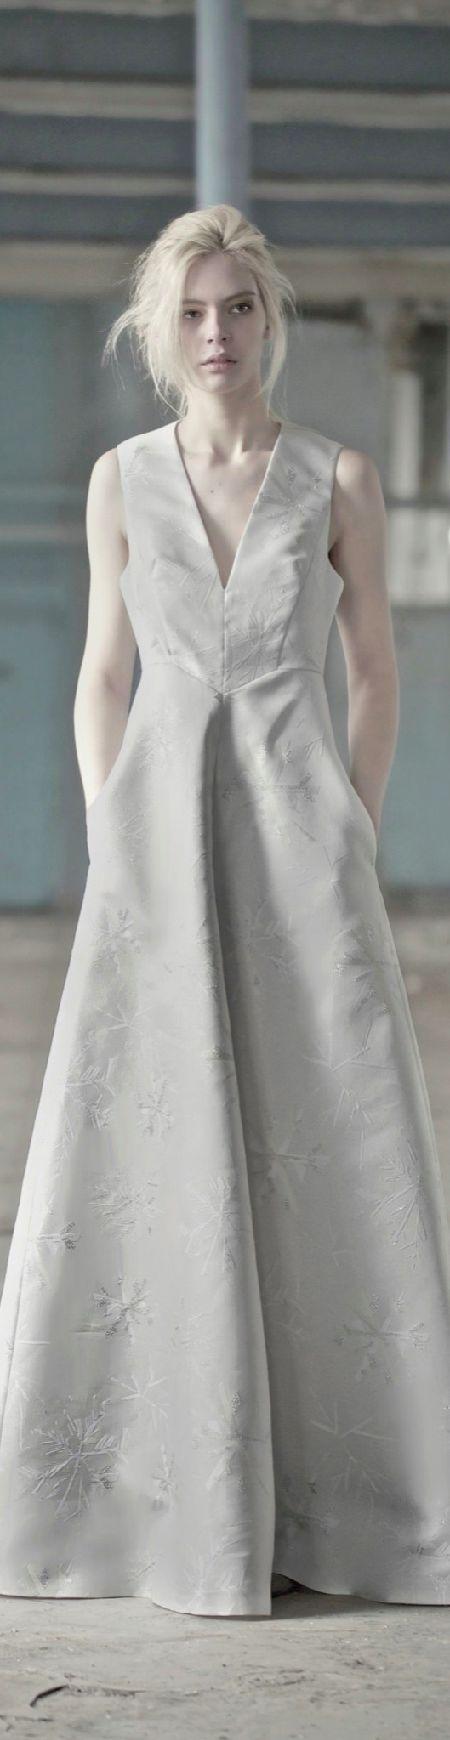 Fall 2015 Ready-to-Wear Vika Gazinskaya